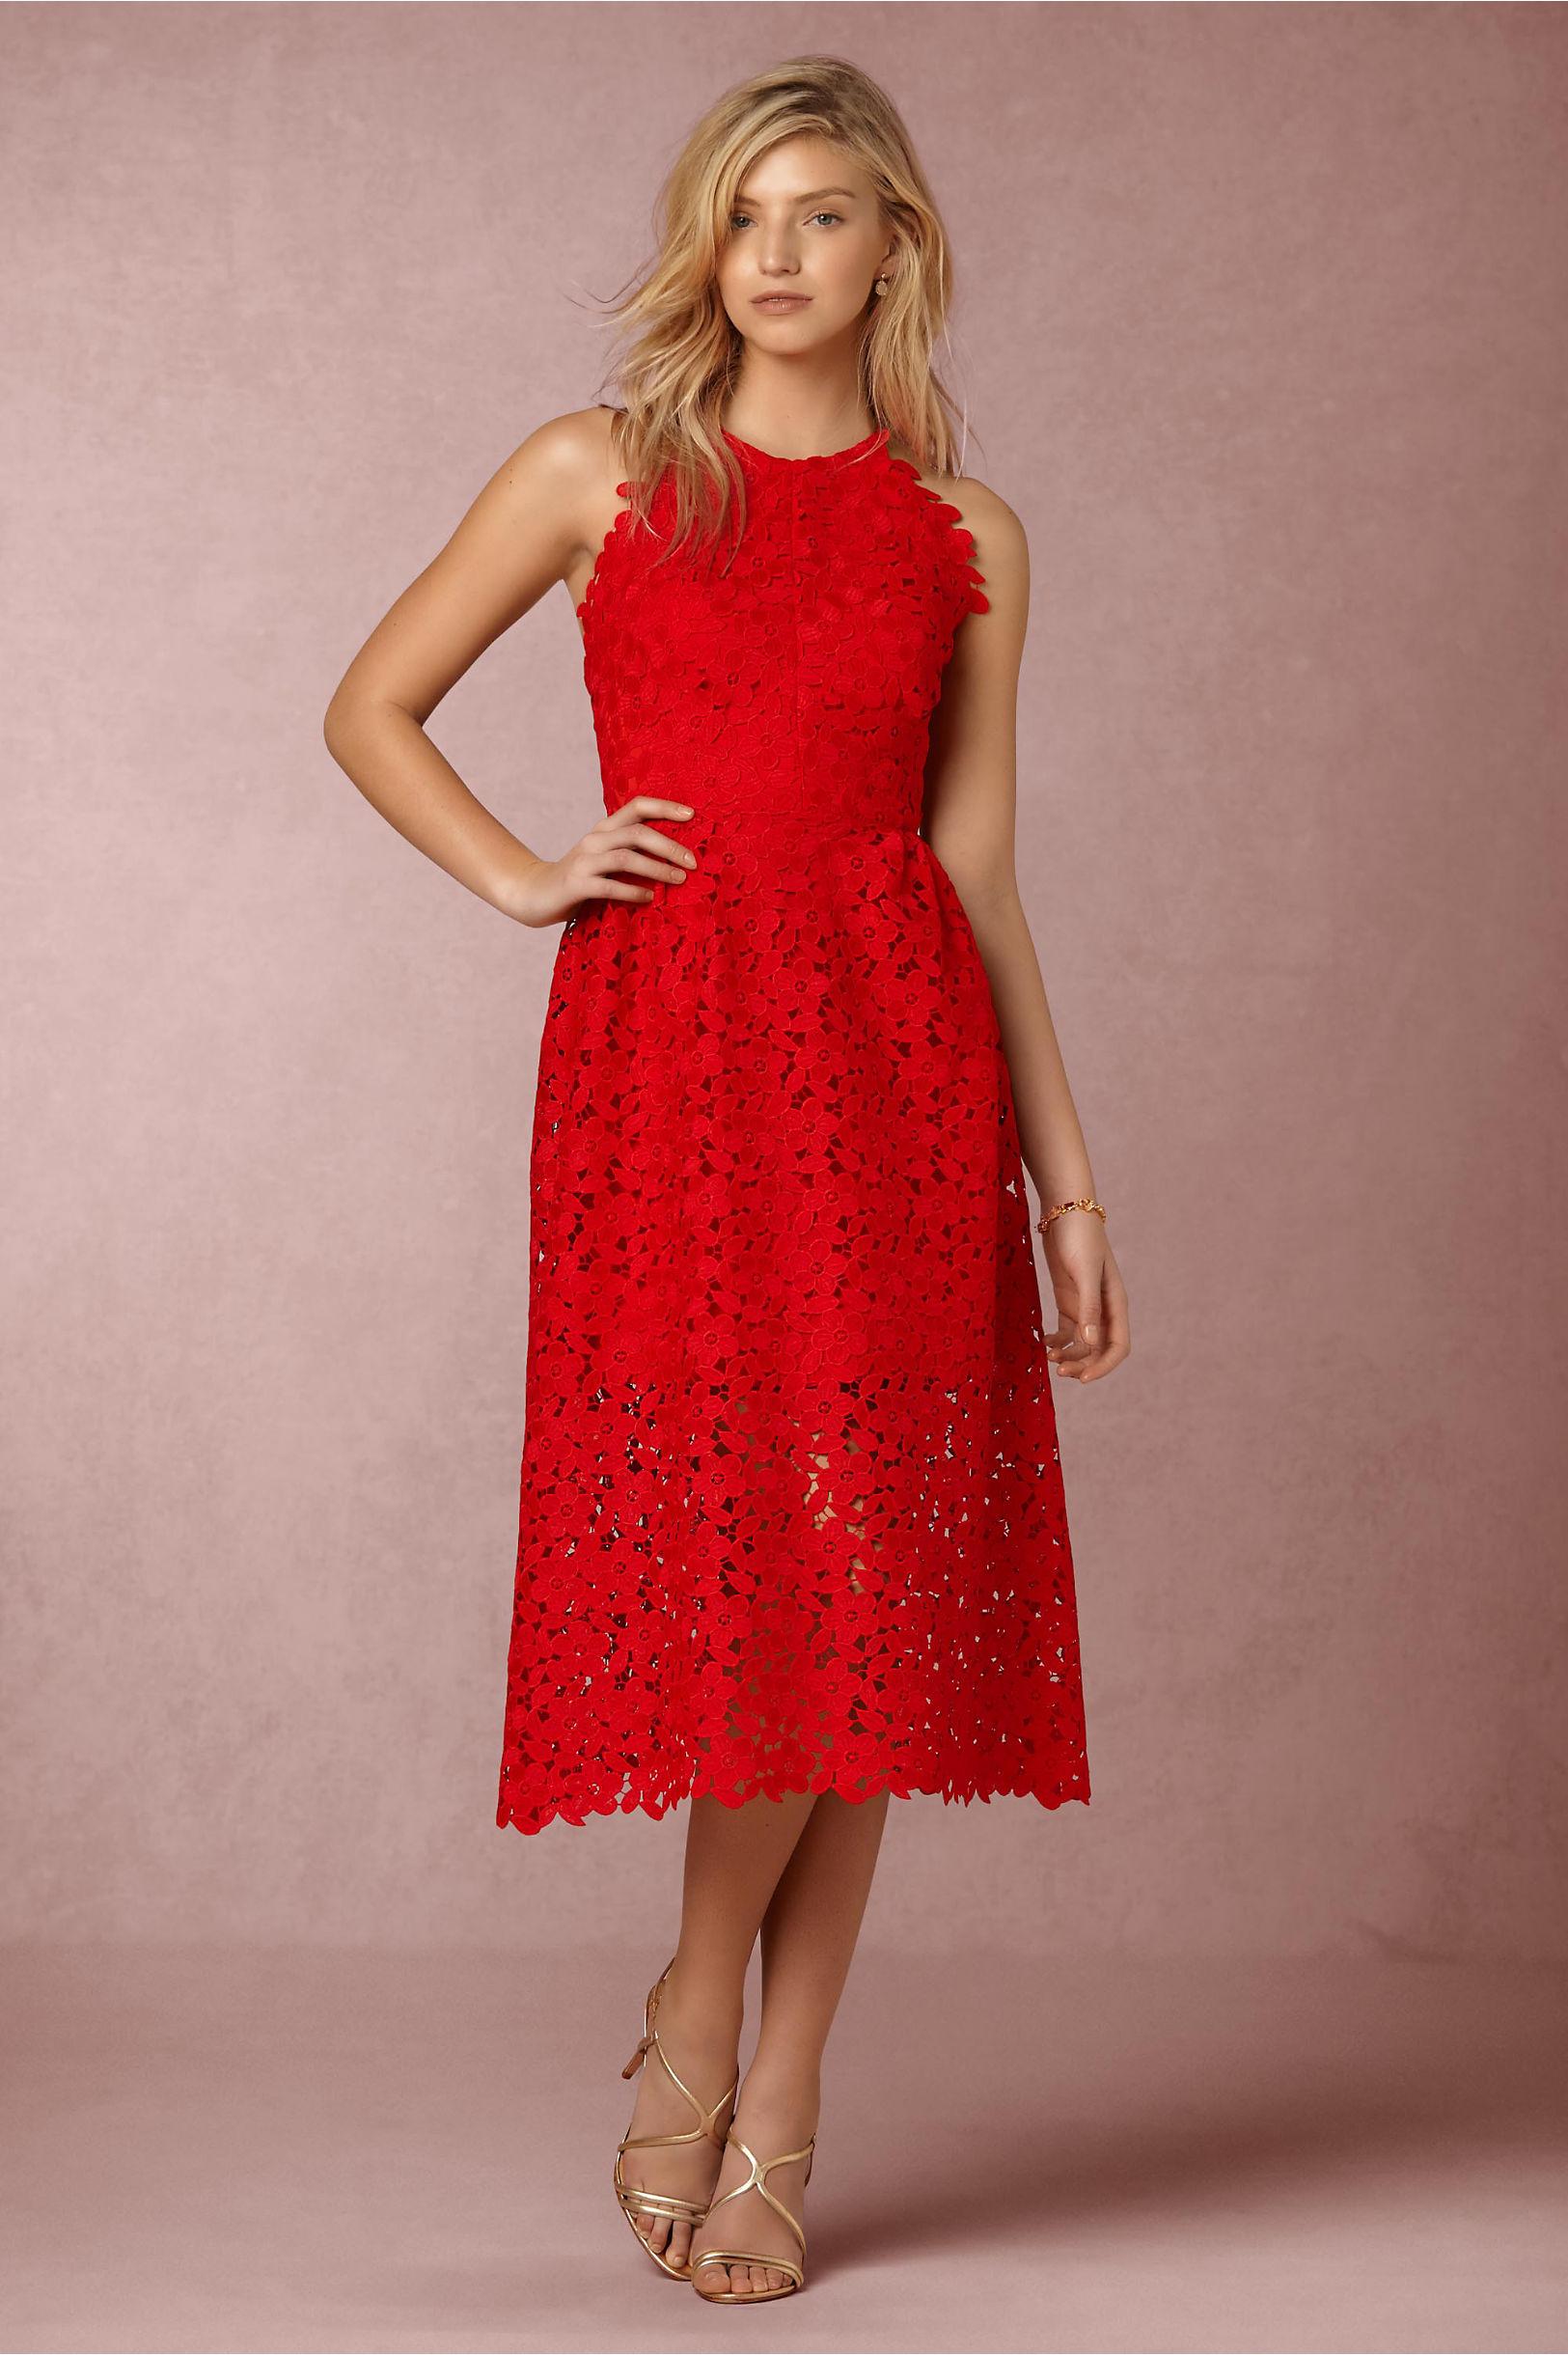 Merci Midi Dress in Sale Dresses | BHLDN